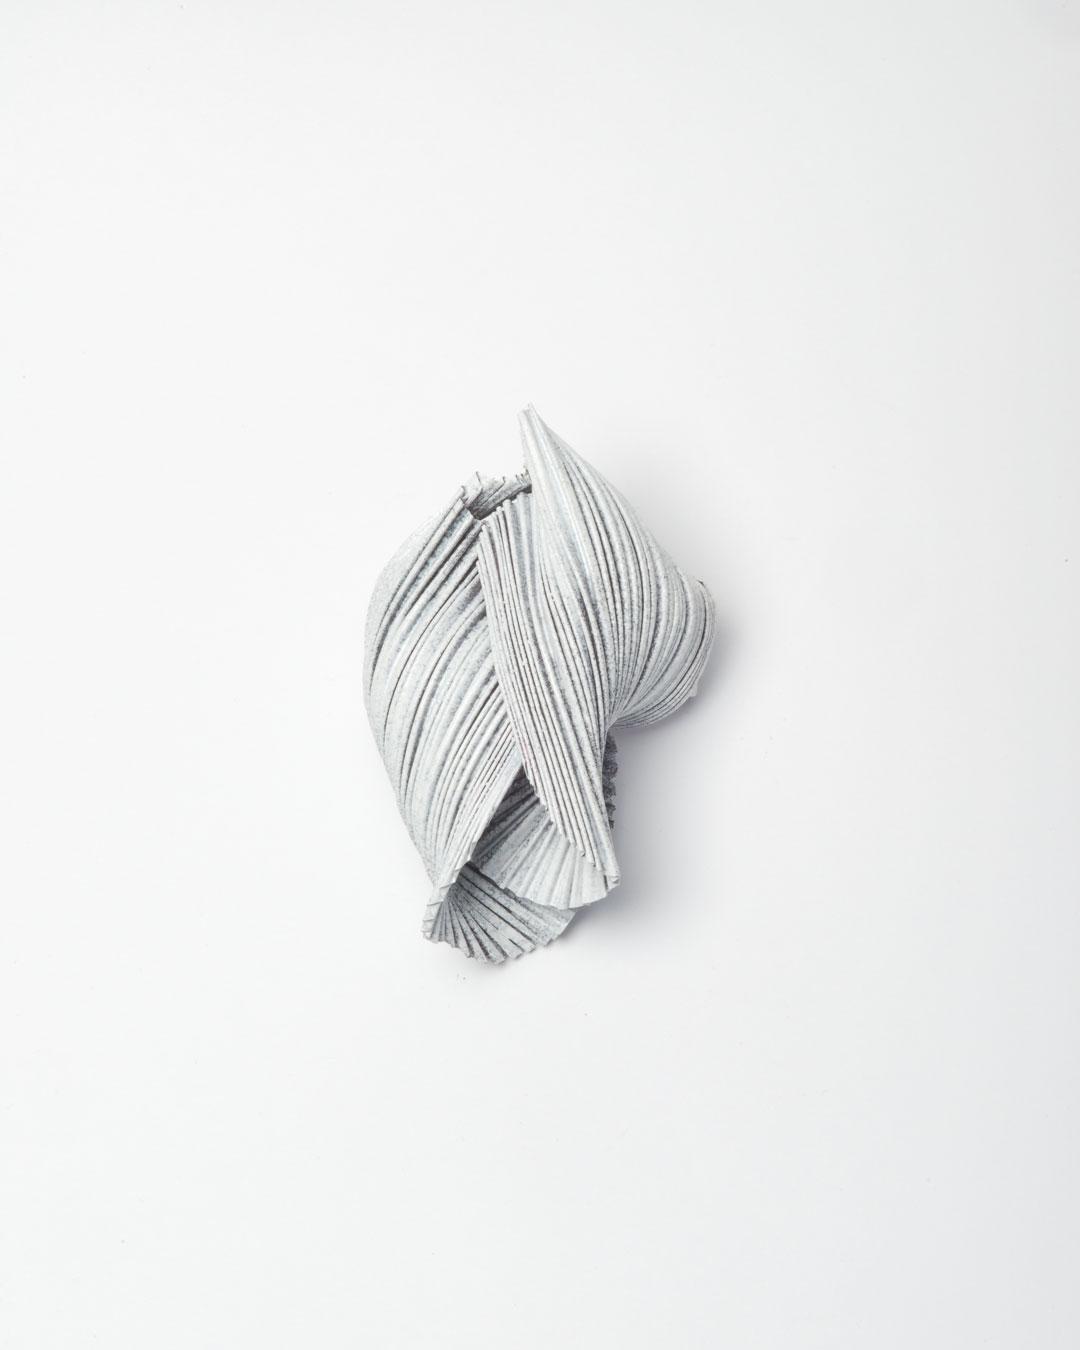 Li Liang, Nr. 6: Line, 2018, brooch; copper, 60 x 40 x 40 mm, €1450